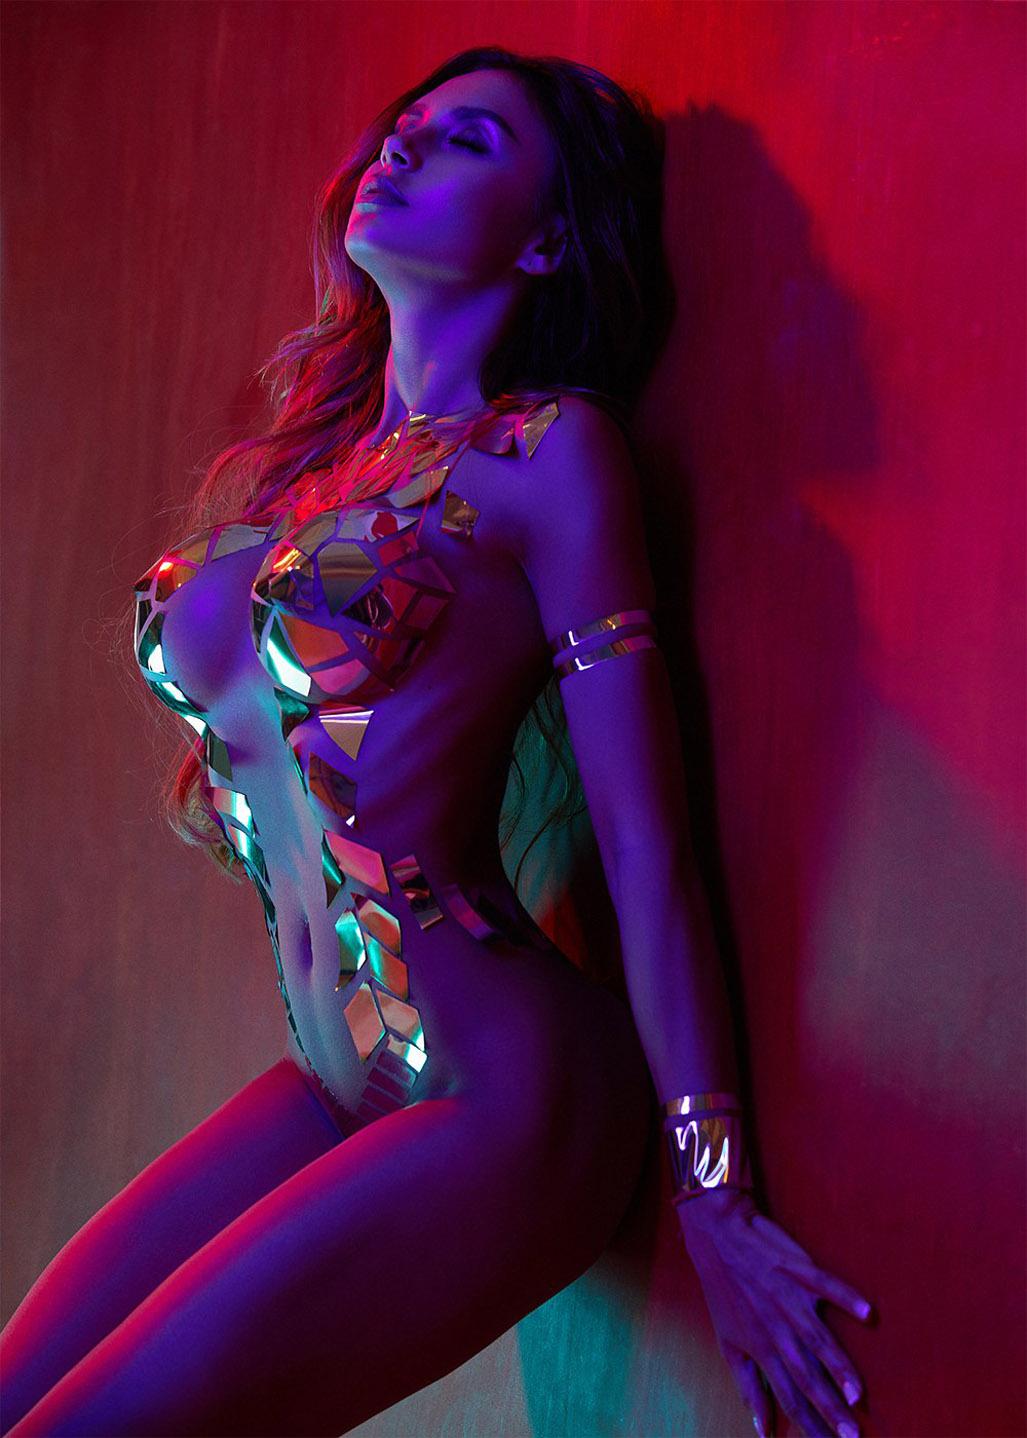 золотые руки мастера и Анастасия Сорокина / Anastasiya Sorokina nude by Alexander Talyuka